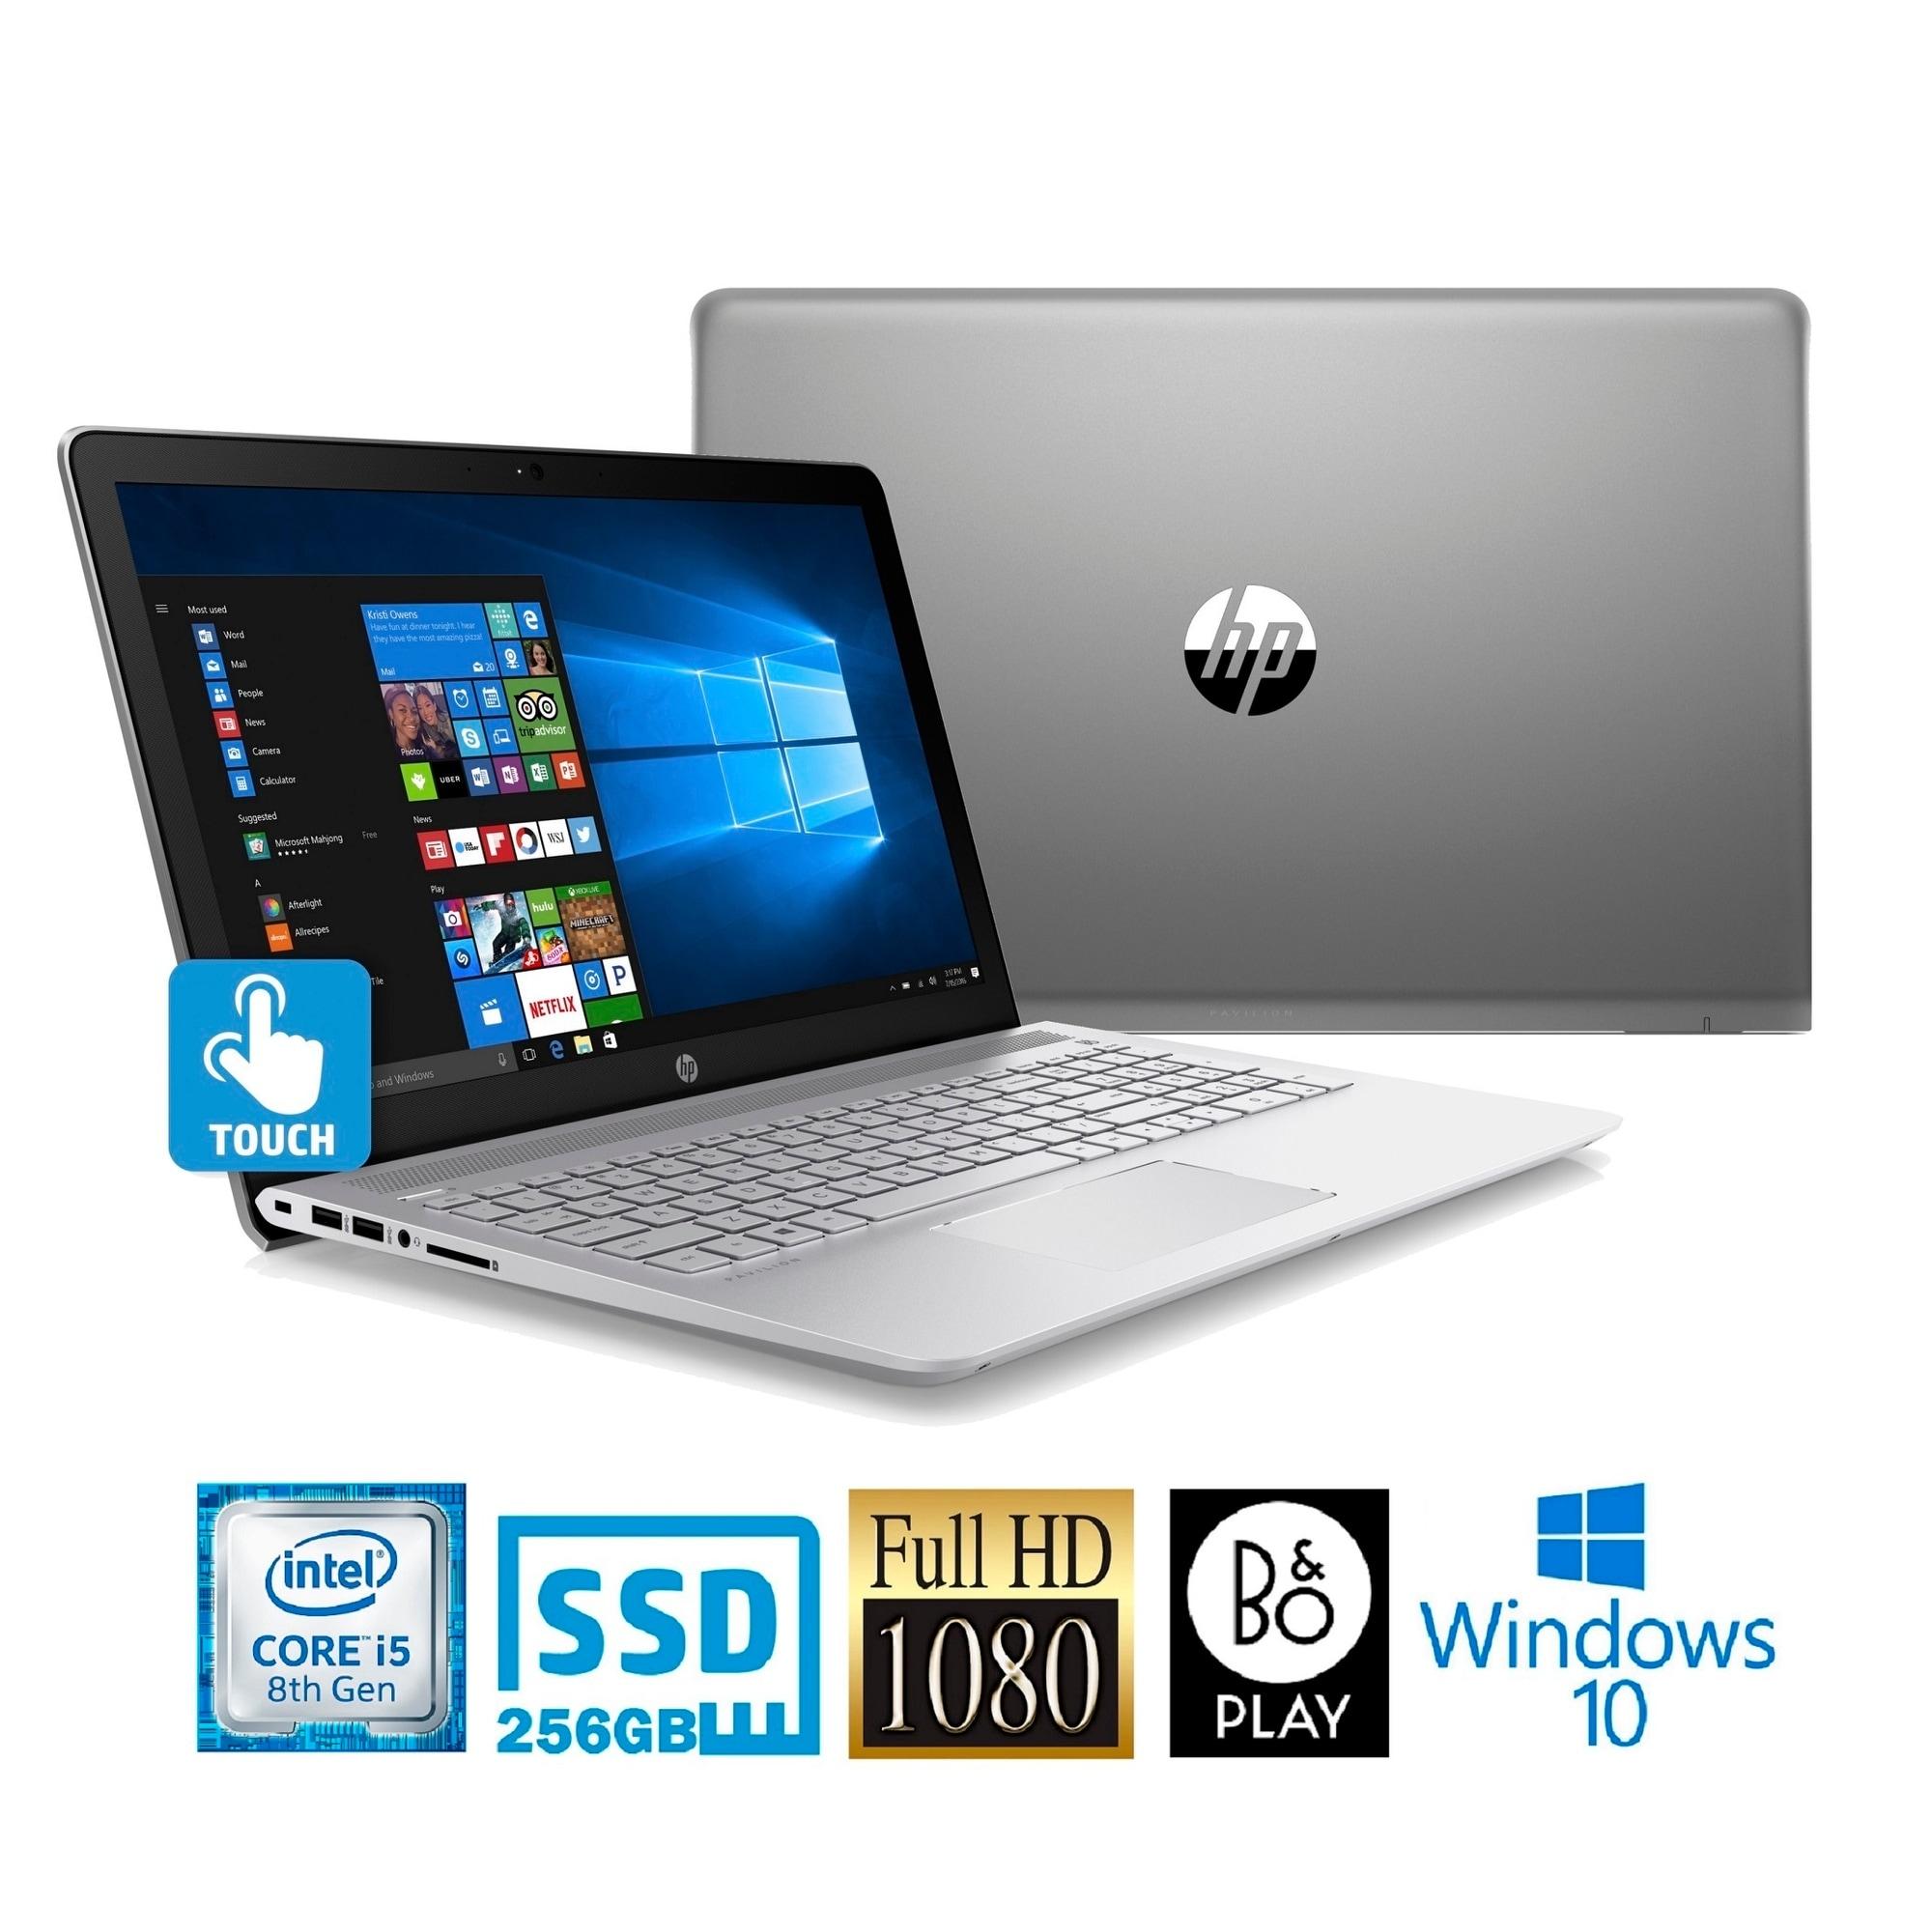 HP Pavilion 15-CC610DS Intel Core i5-8250U 256GB SSD 15 6